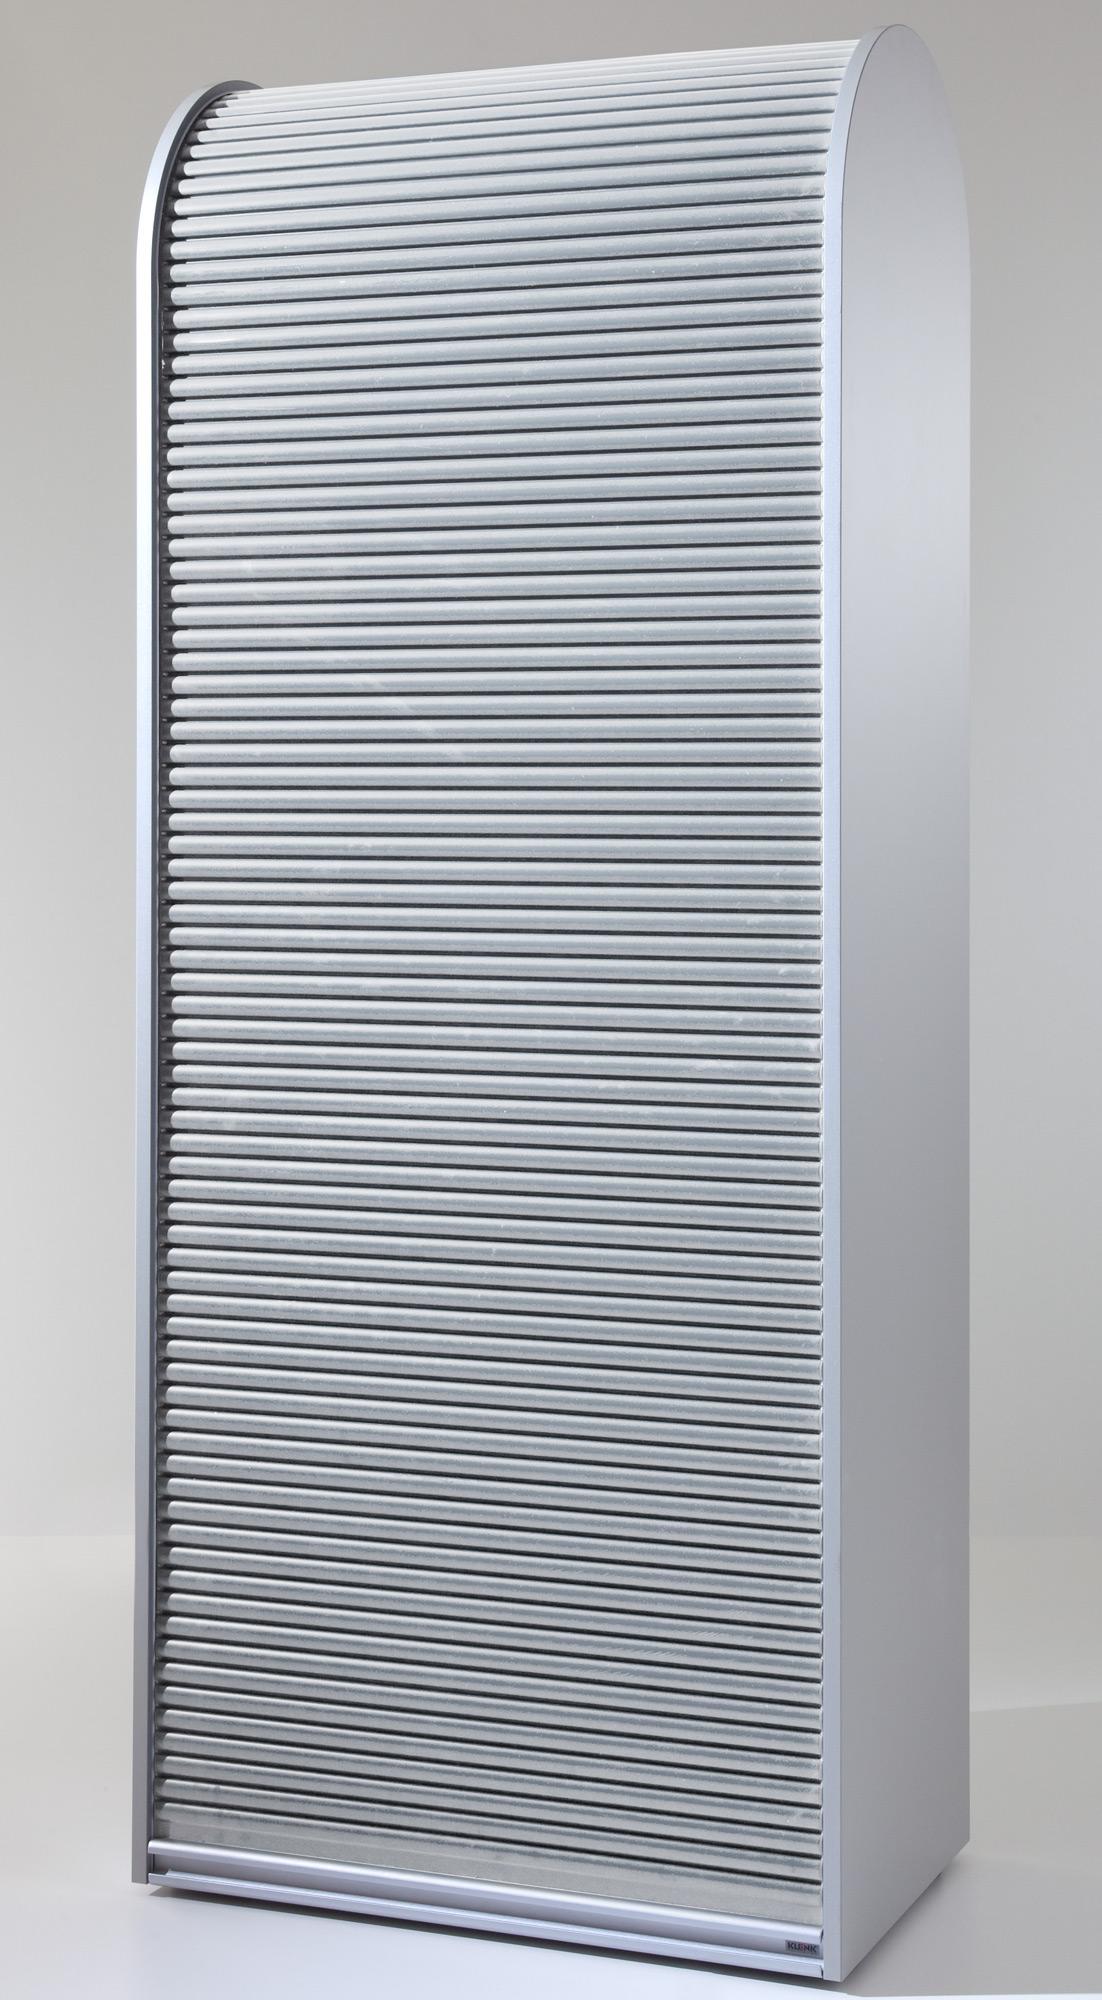 Klenk Aktenschrank Rollladenschrank Abschliessbar Schwarz Silber Weiss Mobelmeile24